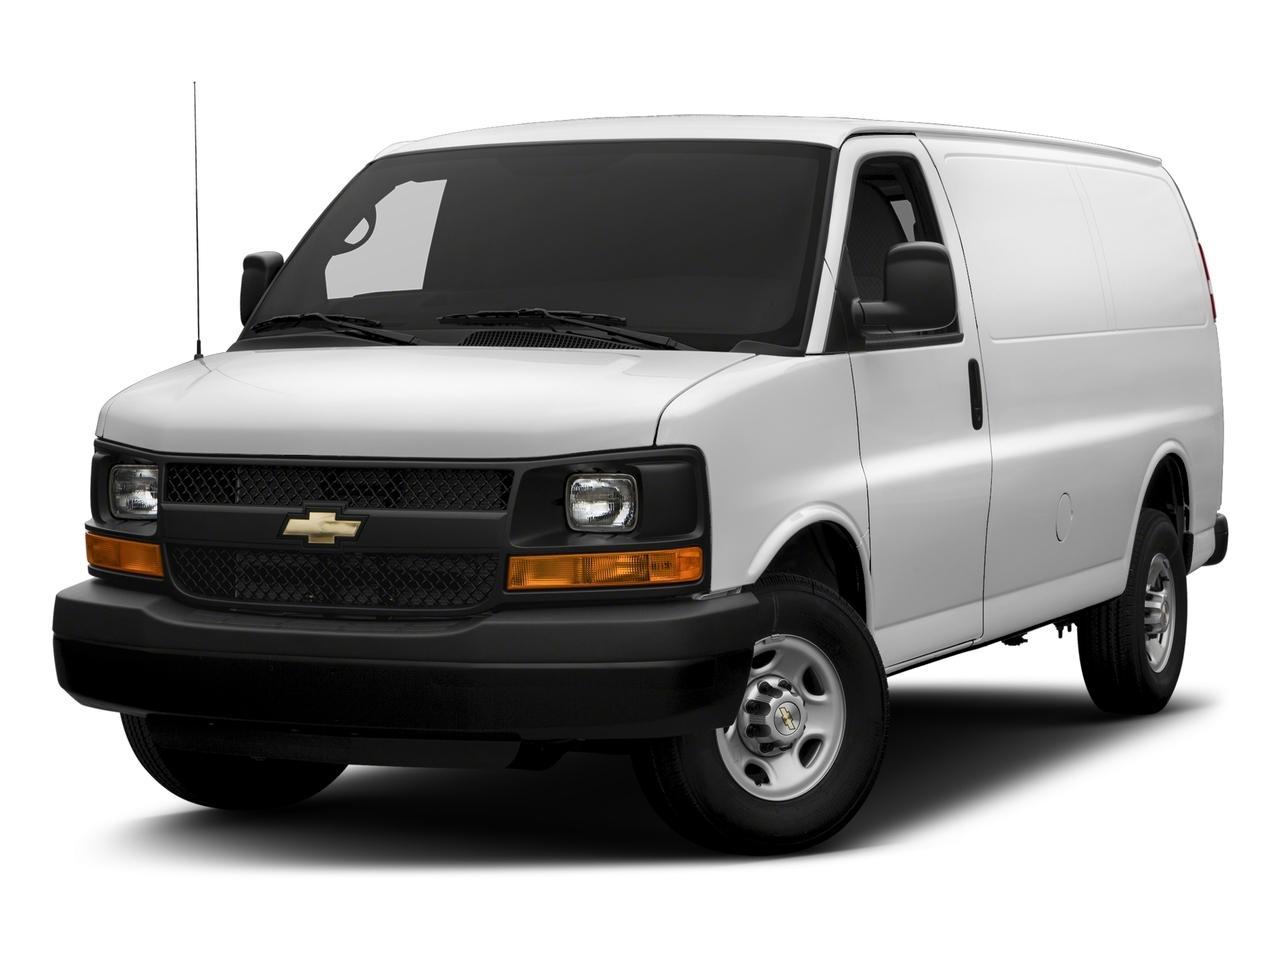 2017 Chevrolet Express Cargo Van Vehicle Photo in Rosenberg, TX 77471